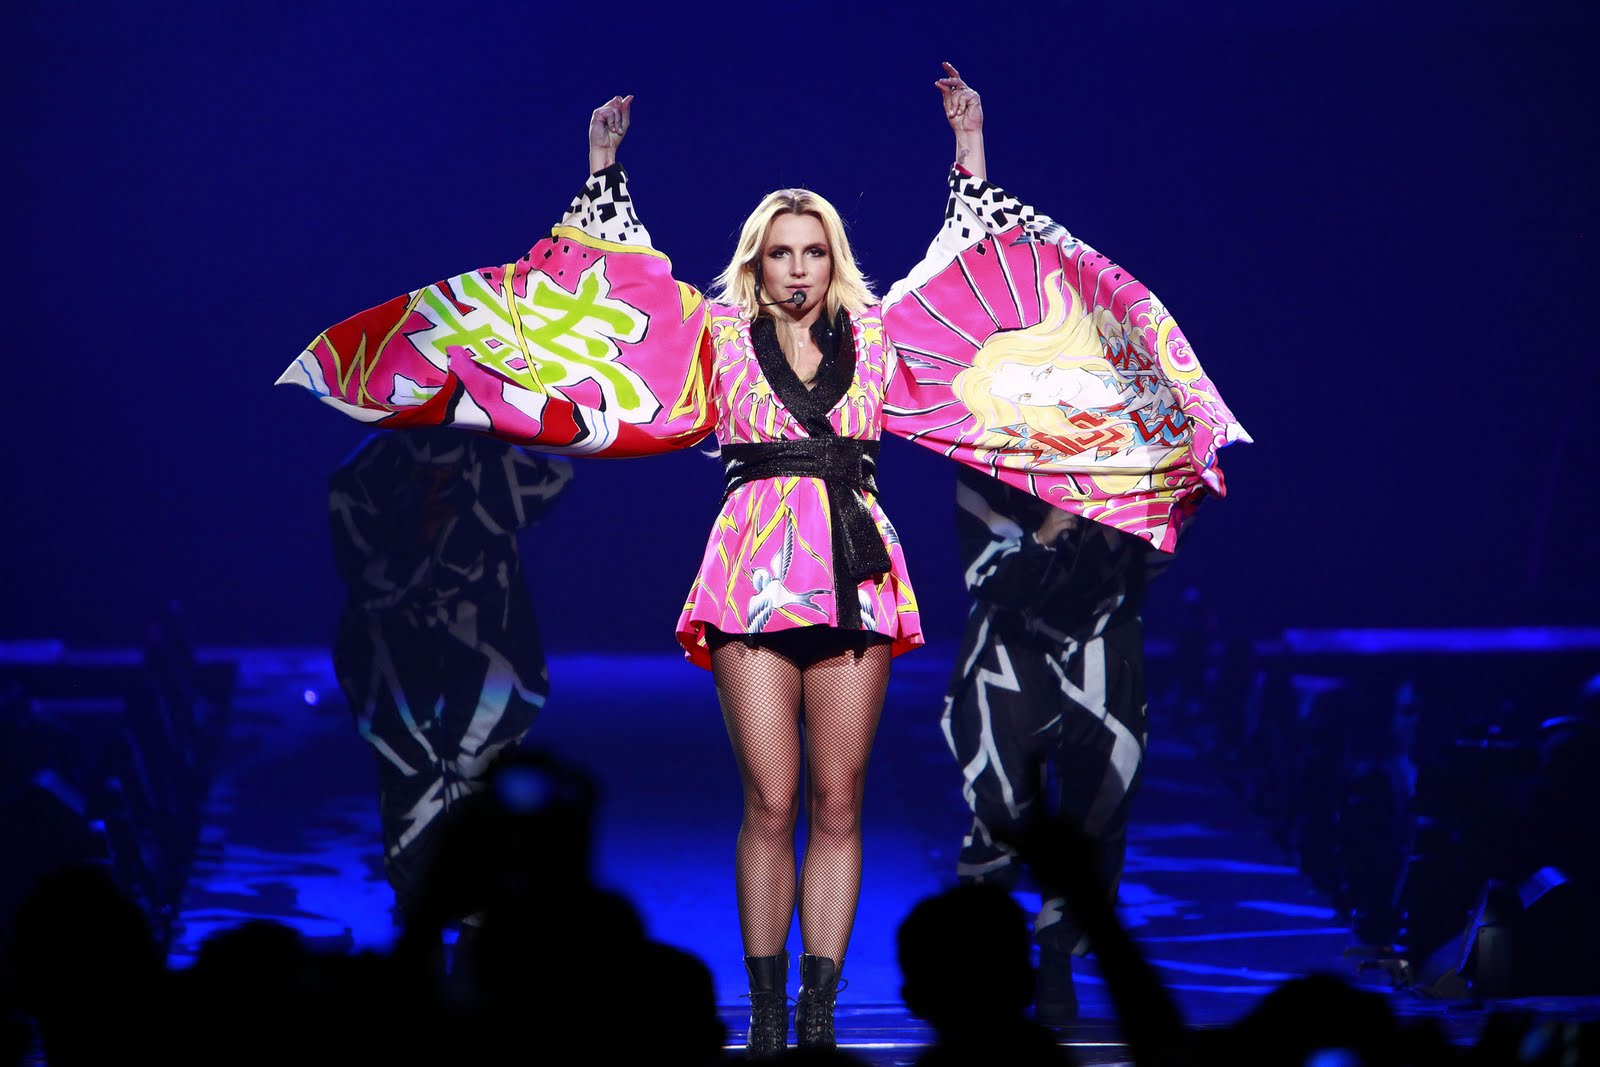 TRY SAMSURI: Britney Spears Femme Fatale Tour Britney Spears Tickets